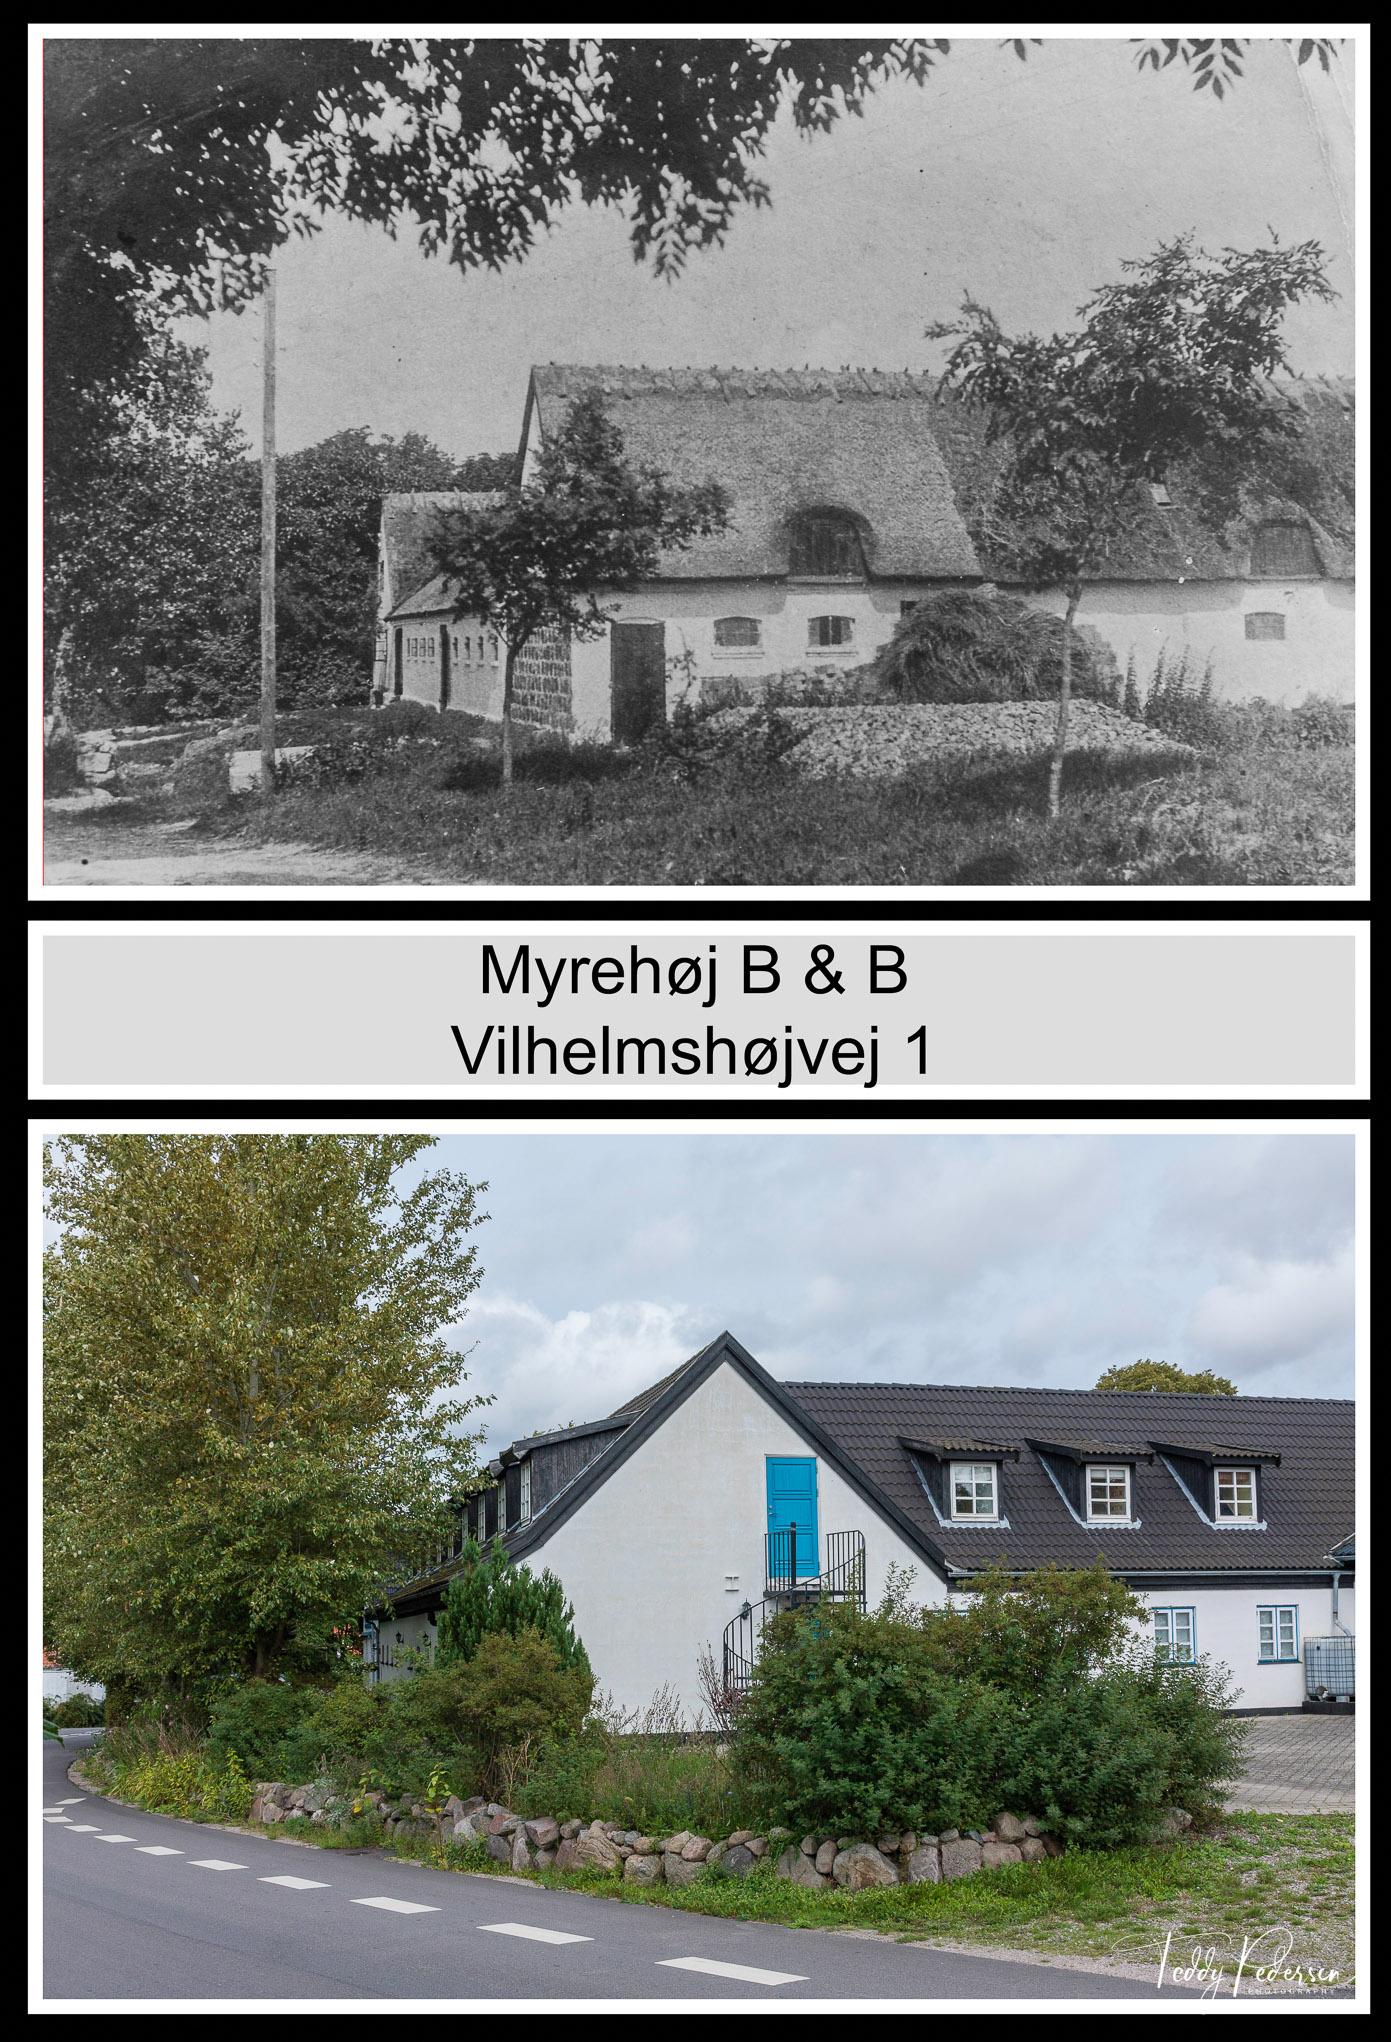 023-006-Myrehøj_HighRes_LowRes